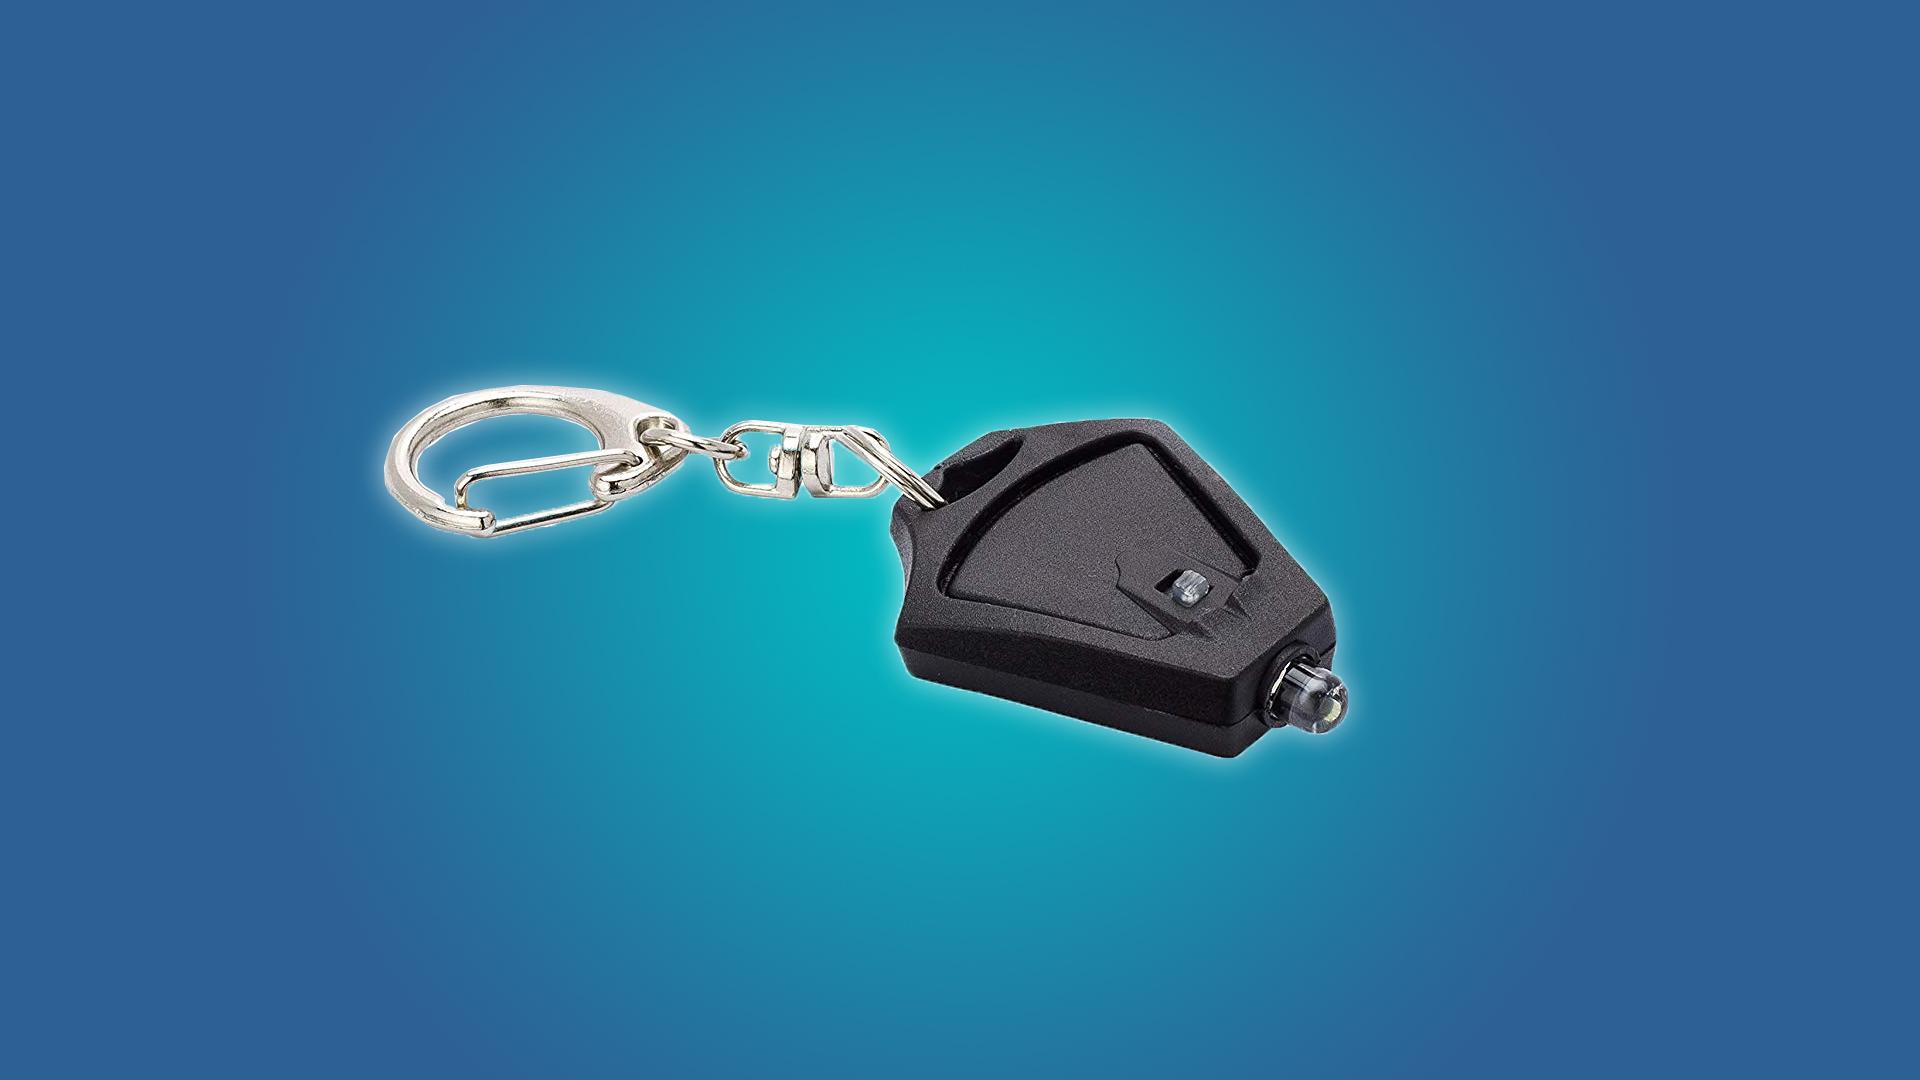 THe Finware Micro Light LED Keychain Flashlight 5-Pack